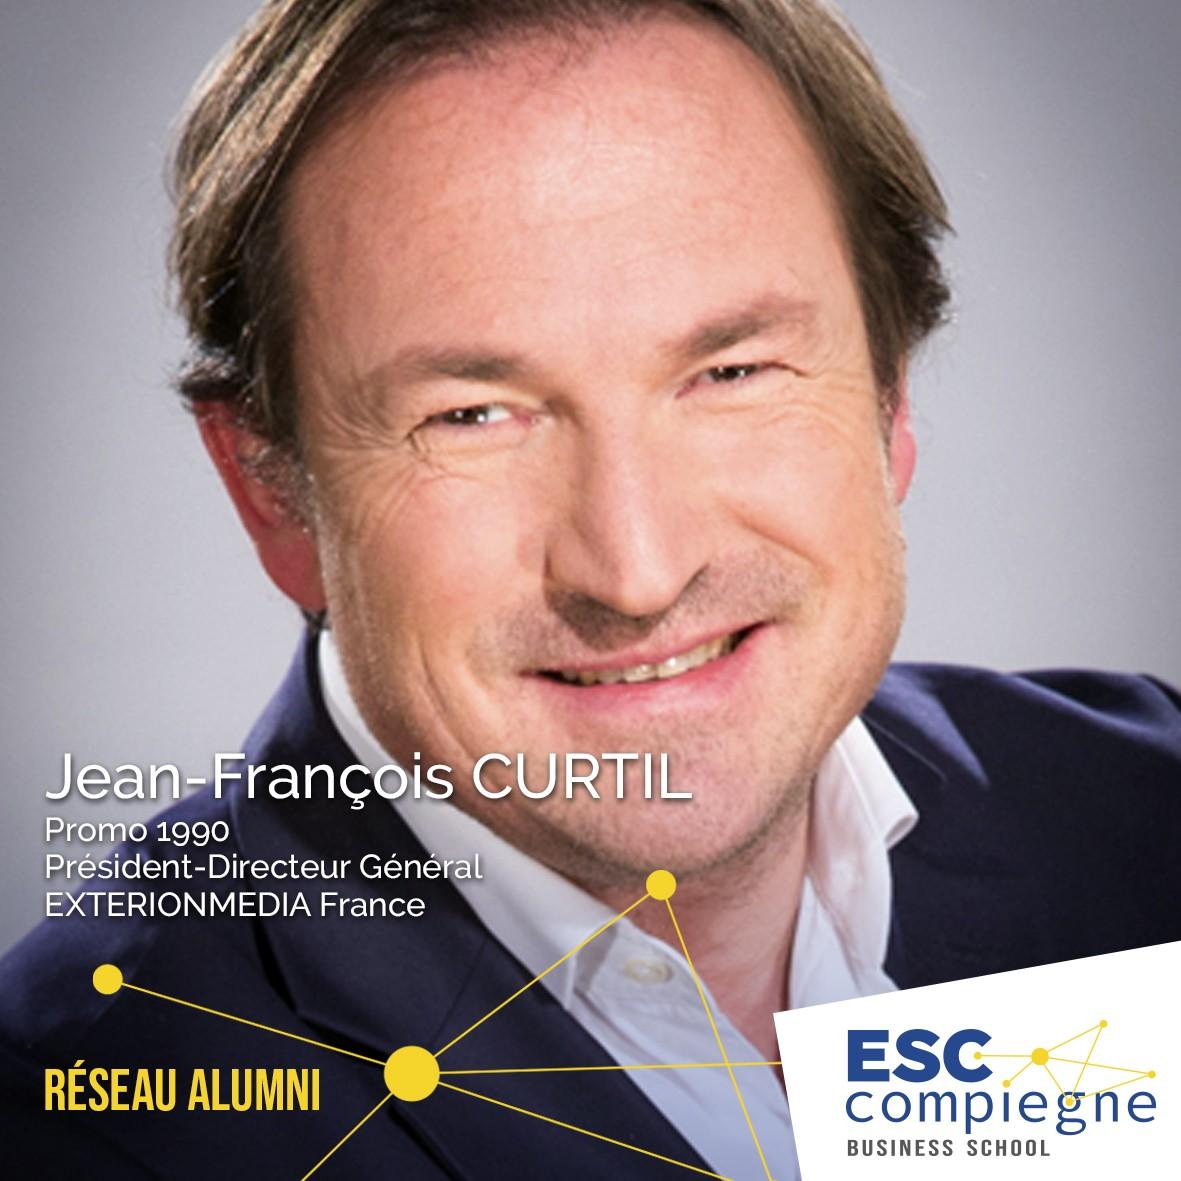 ESCC-Temoignage-JF-Curtil